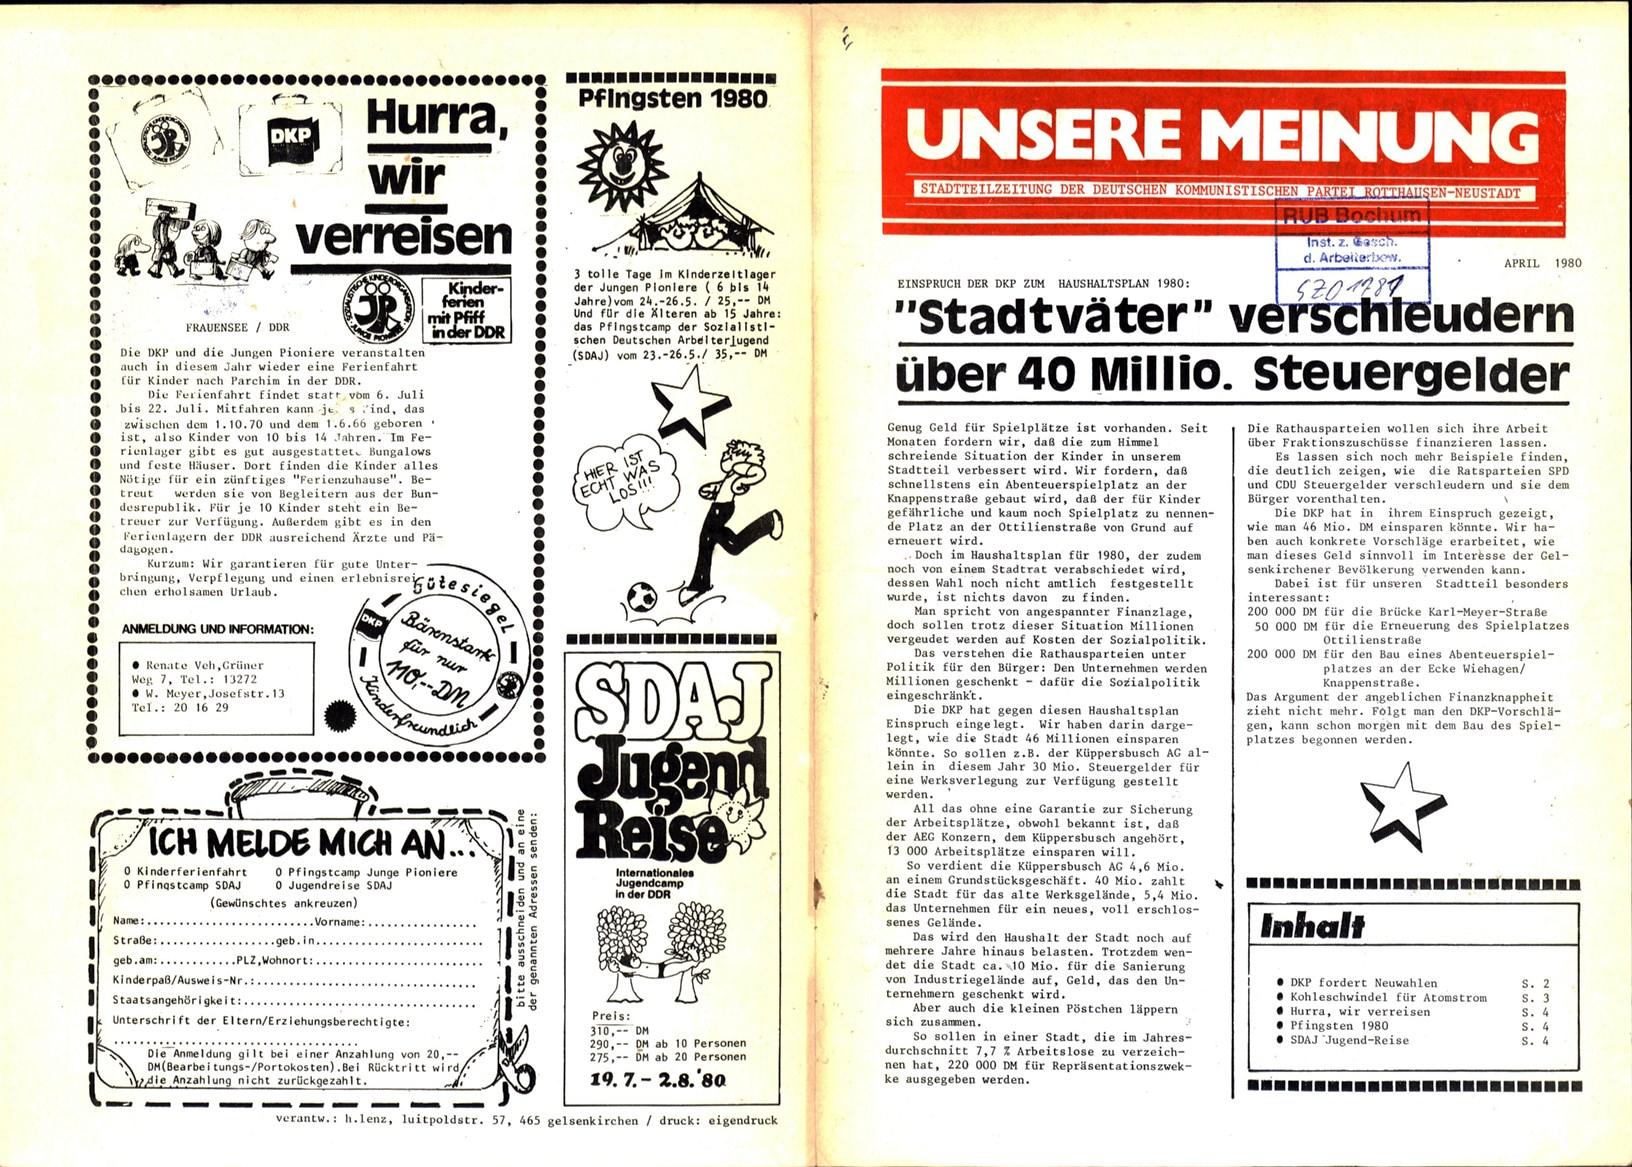 Gelsenkirchen_DKP_Unsere_Meinung_19800400_01